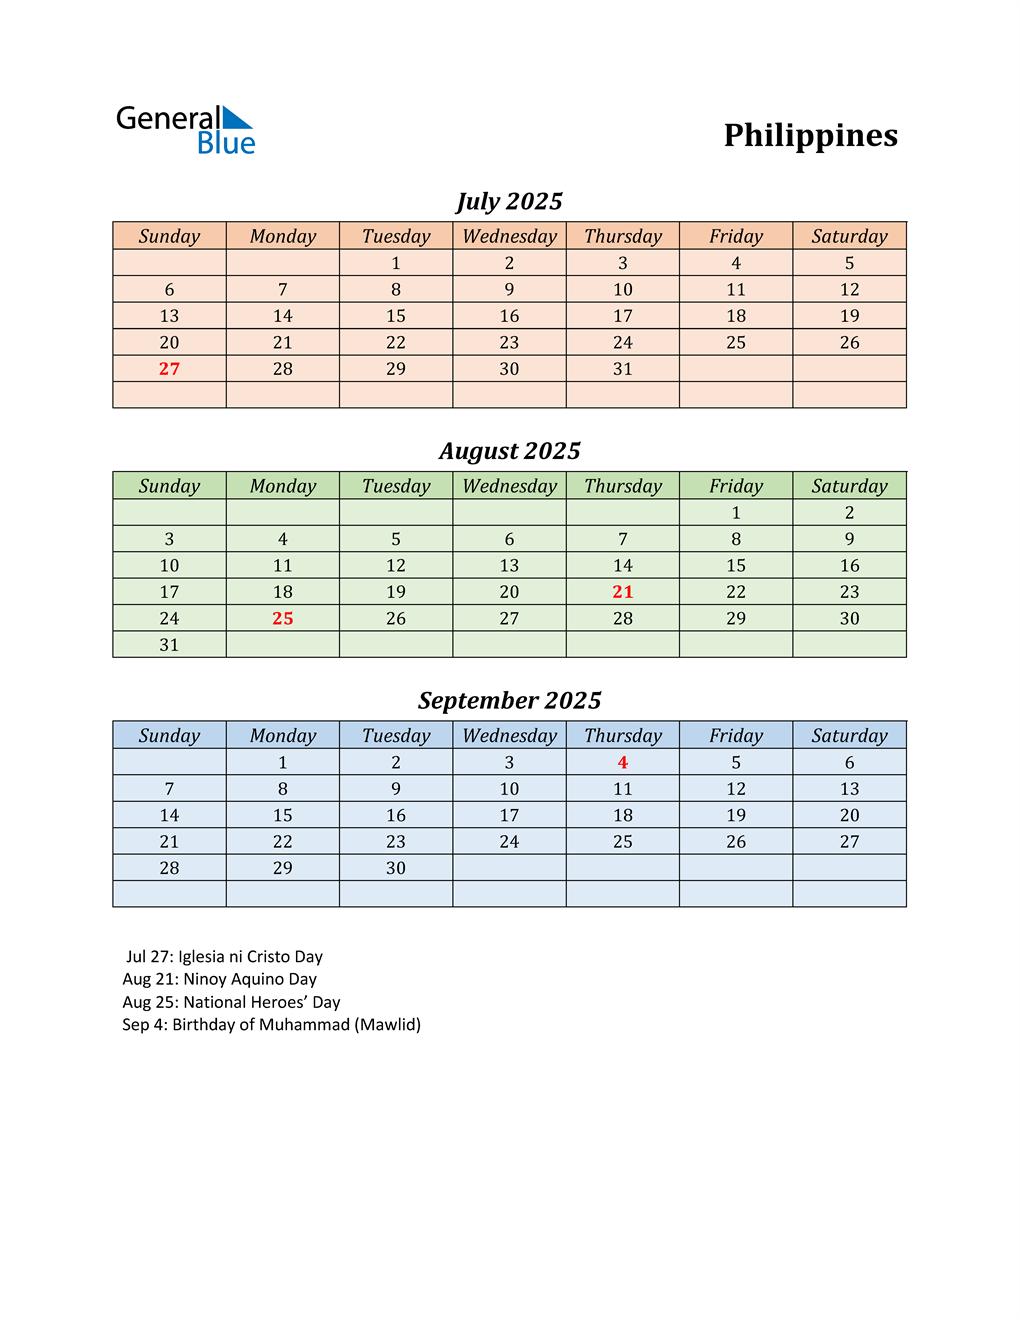 Q3 2025 Holiday Calendar - Philippines